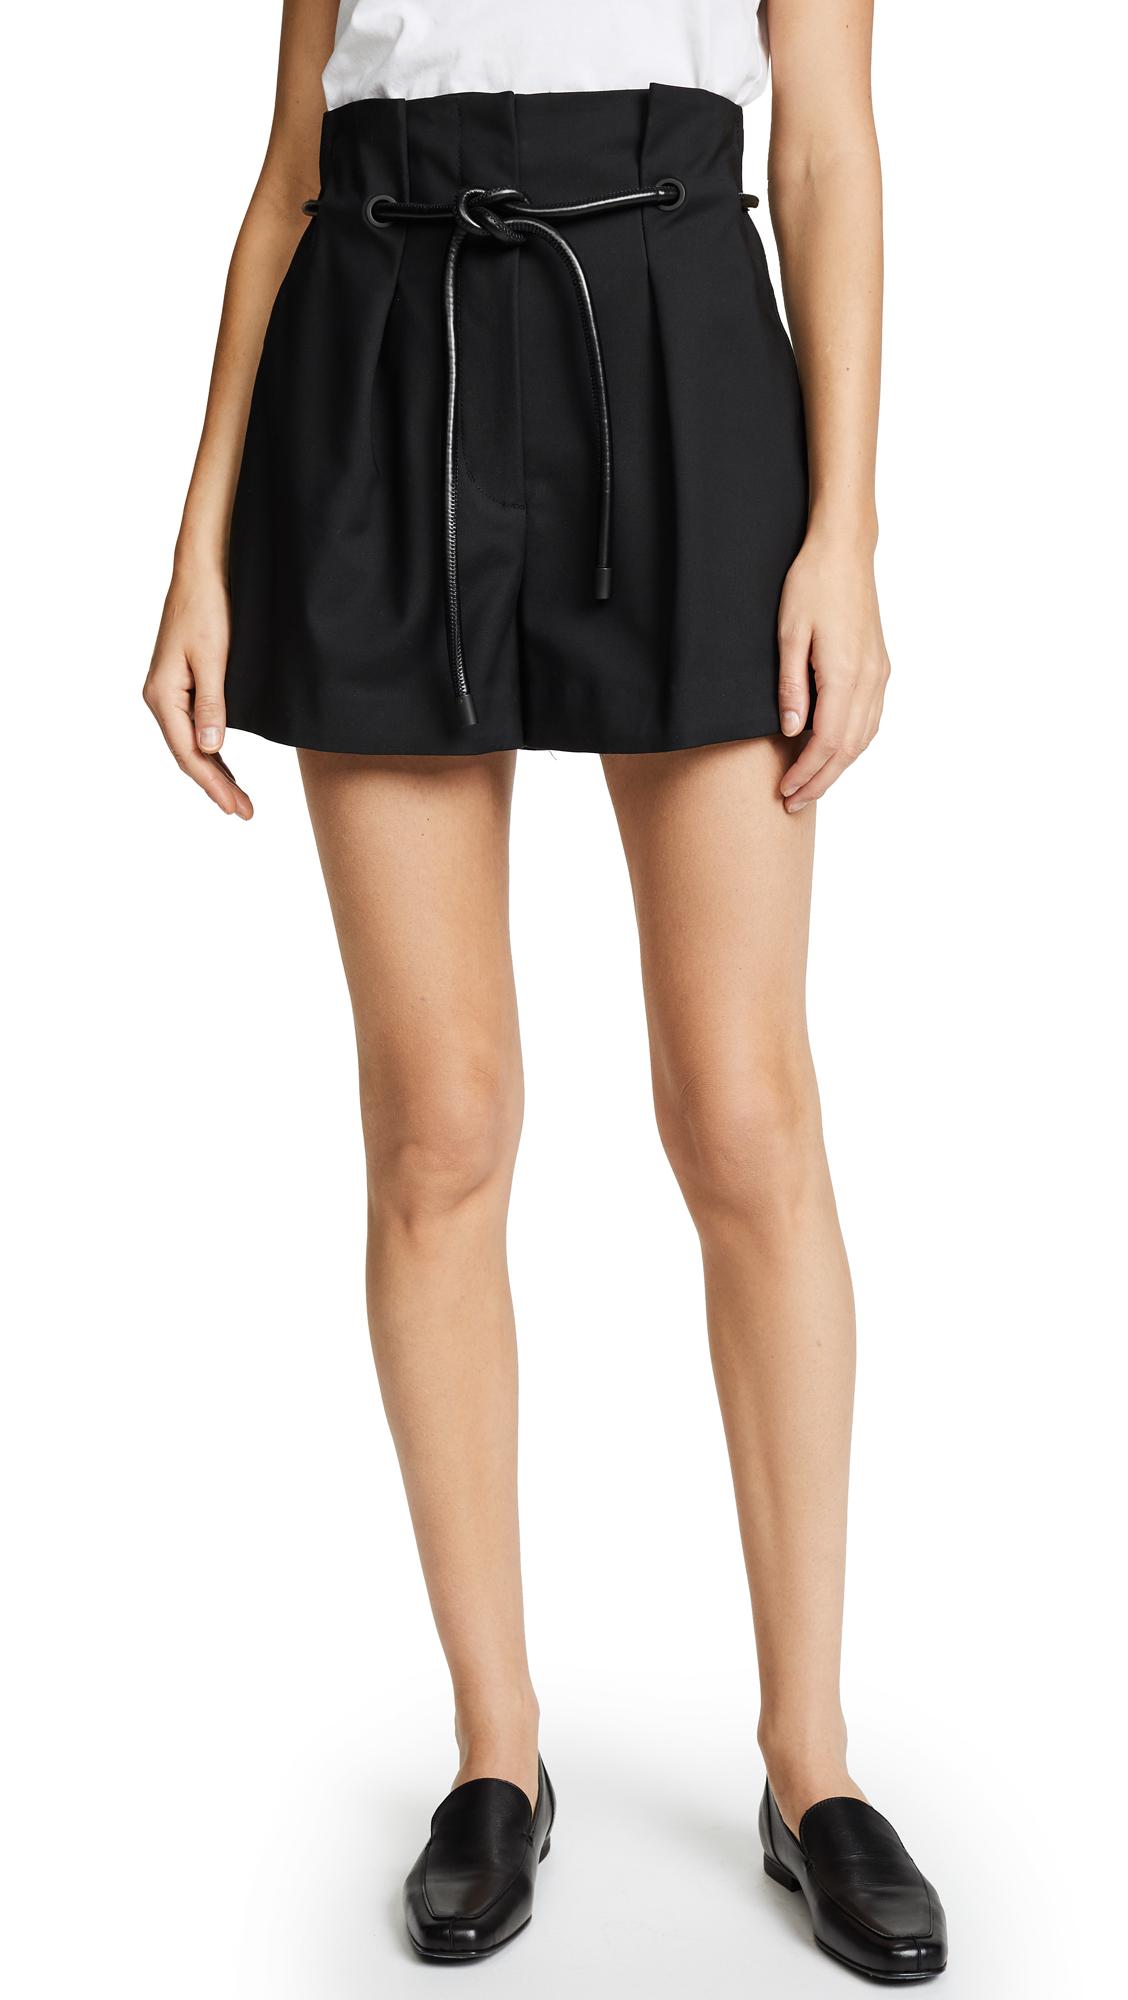 3.1 Phillip Lim Origami Pleated Shorts - Black